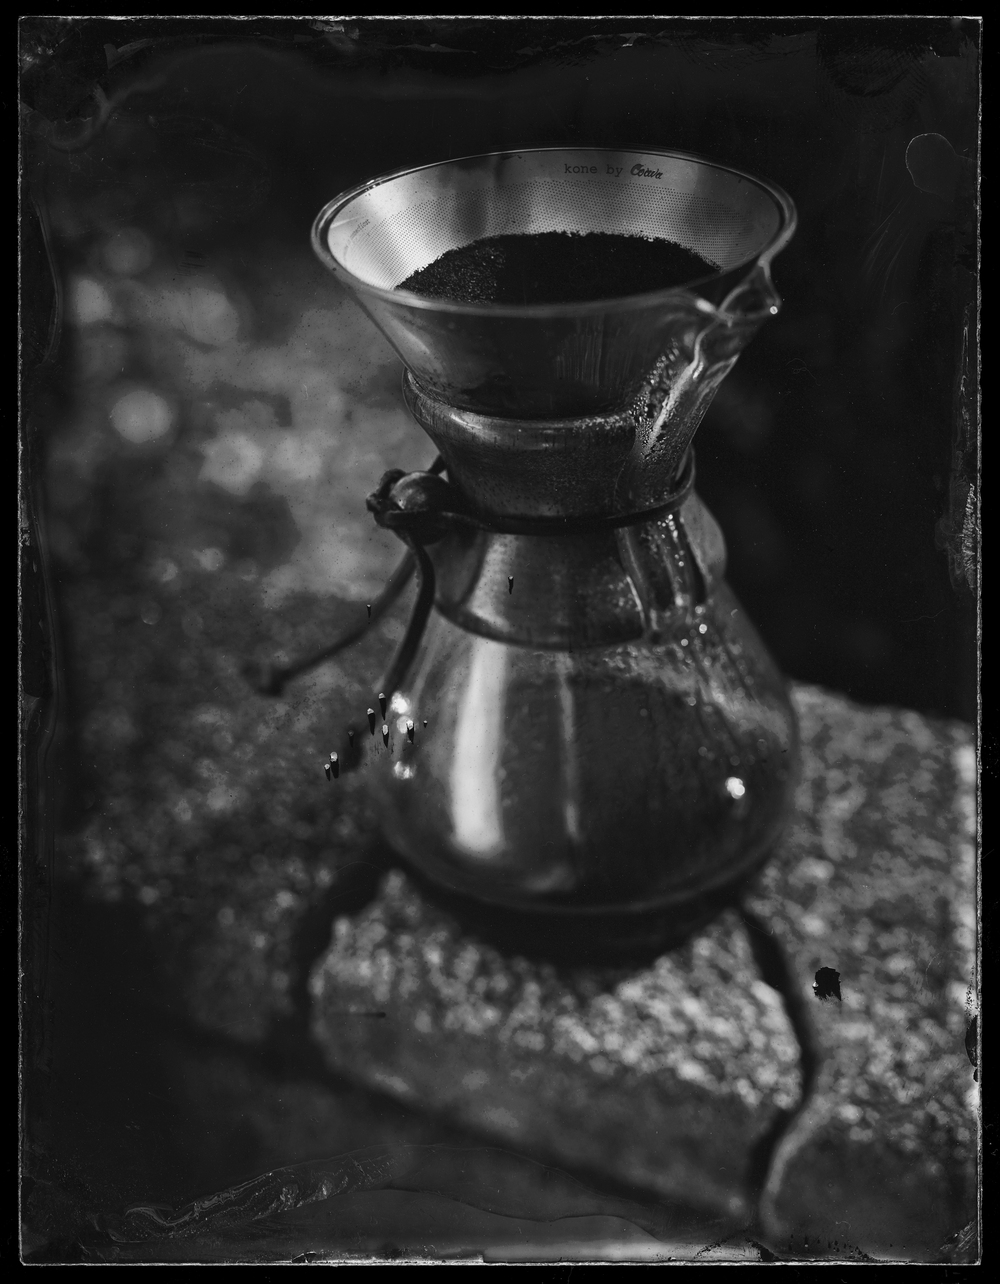 A CoffeeChemex003sepia-2.jpg